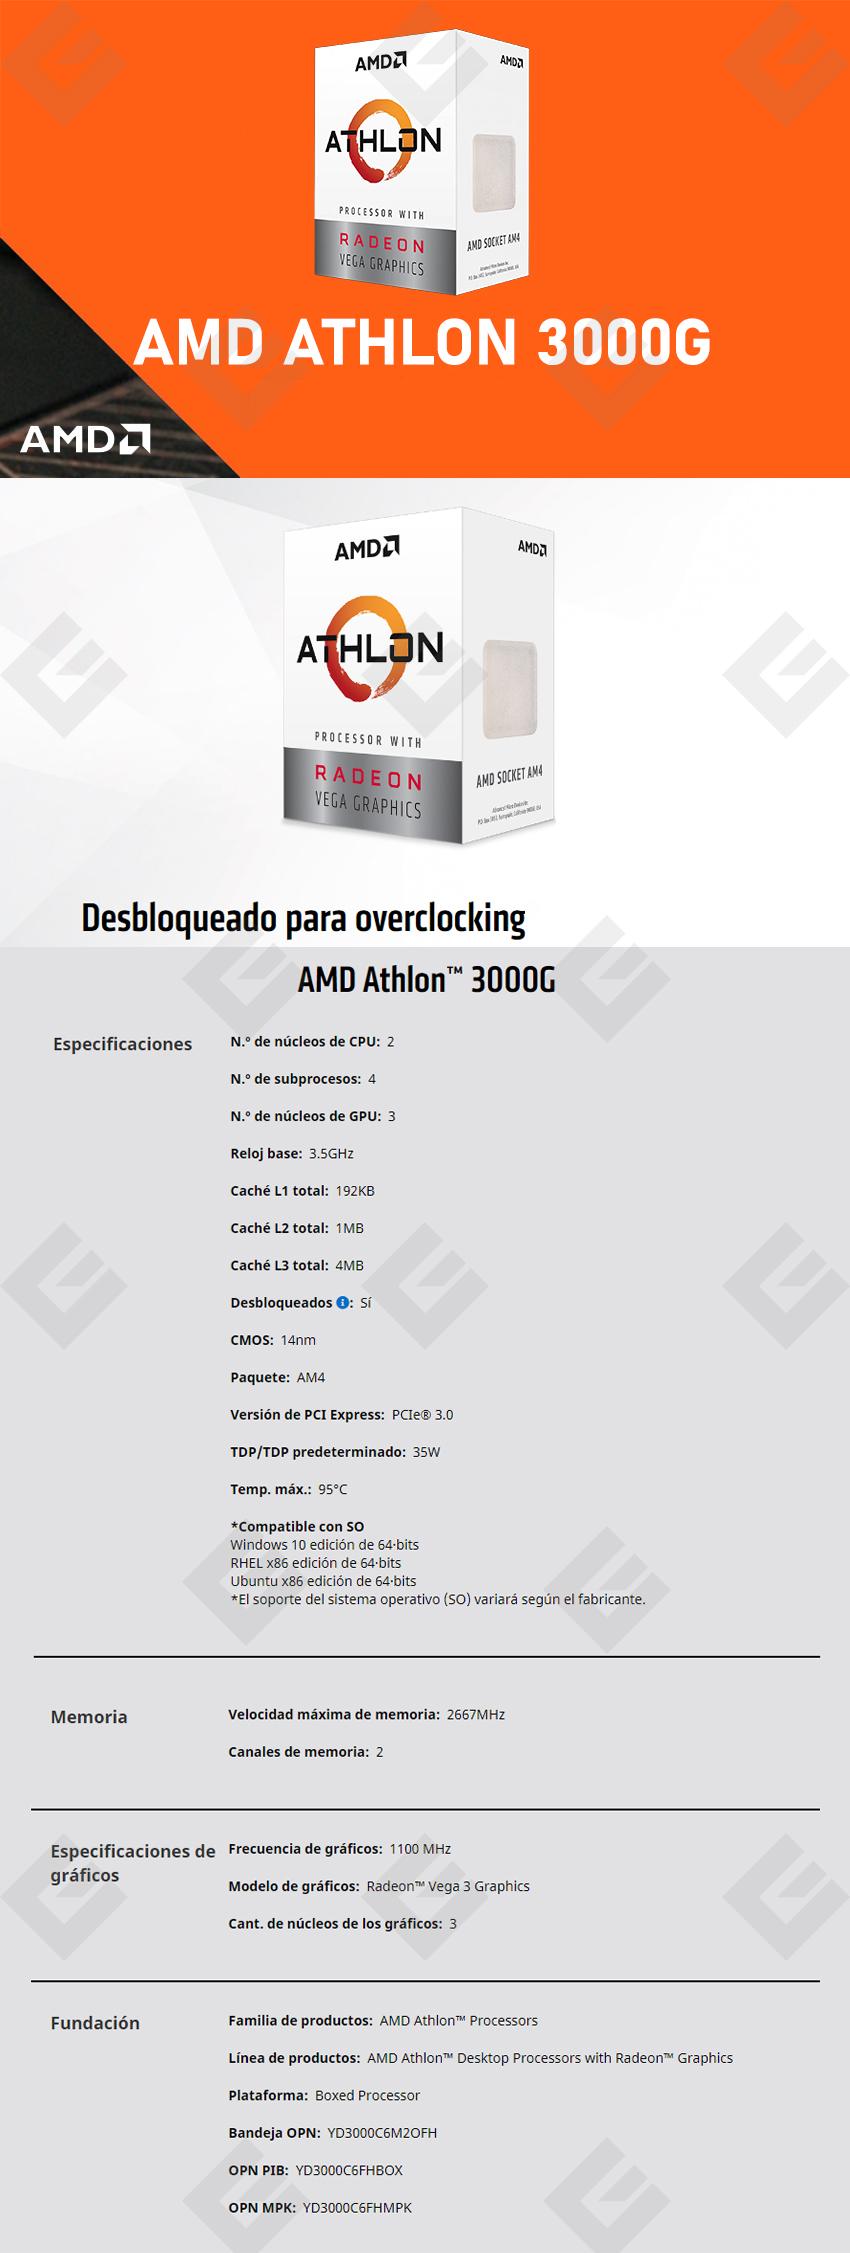 Procesador AMD Athlon 3000G, 2 Cores, 4 Threads, Radeon Vega 3 Graphics, 3.5Ghz Base, Socket AM4